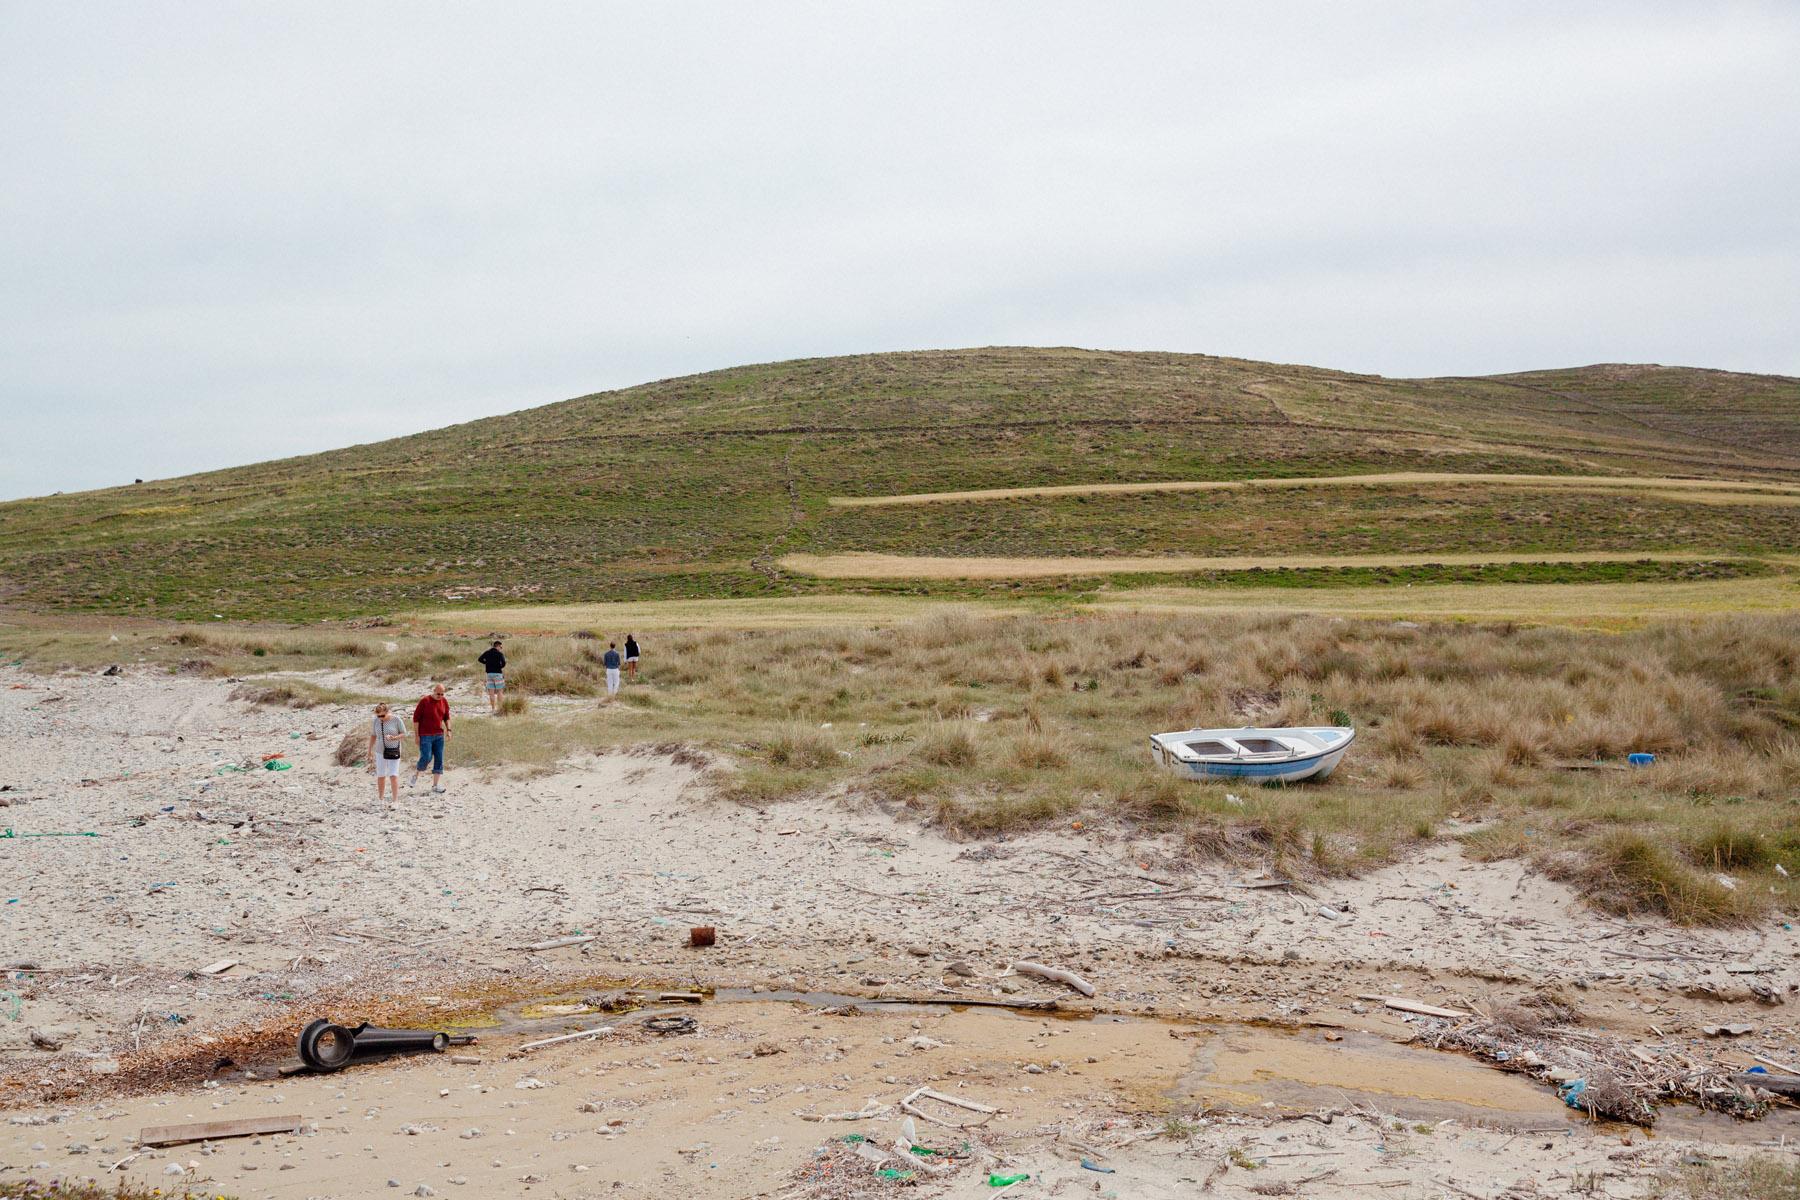 The uninhabited island of Rineia, with a beach full of trash and gigantic snake skulls